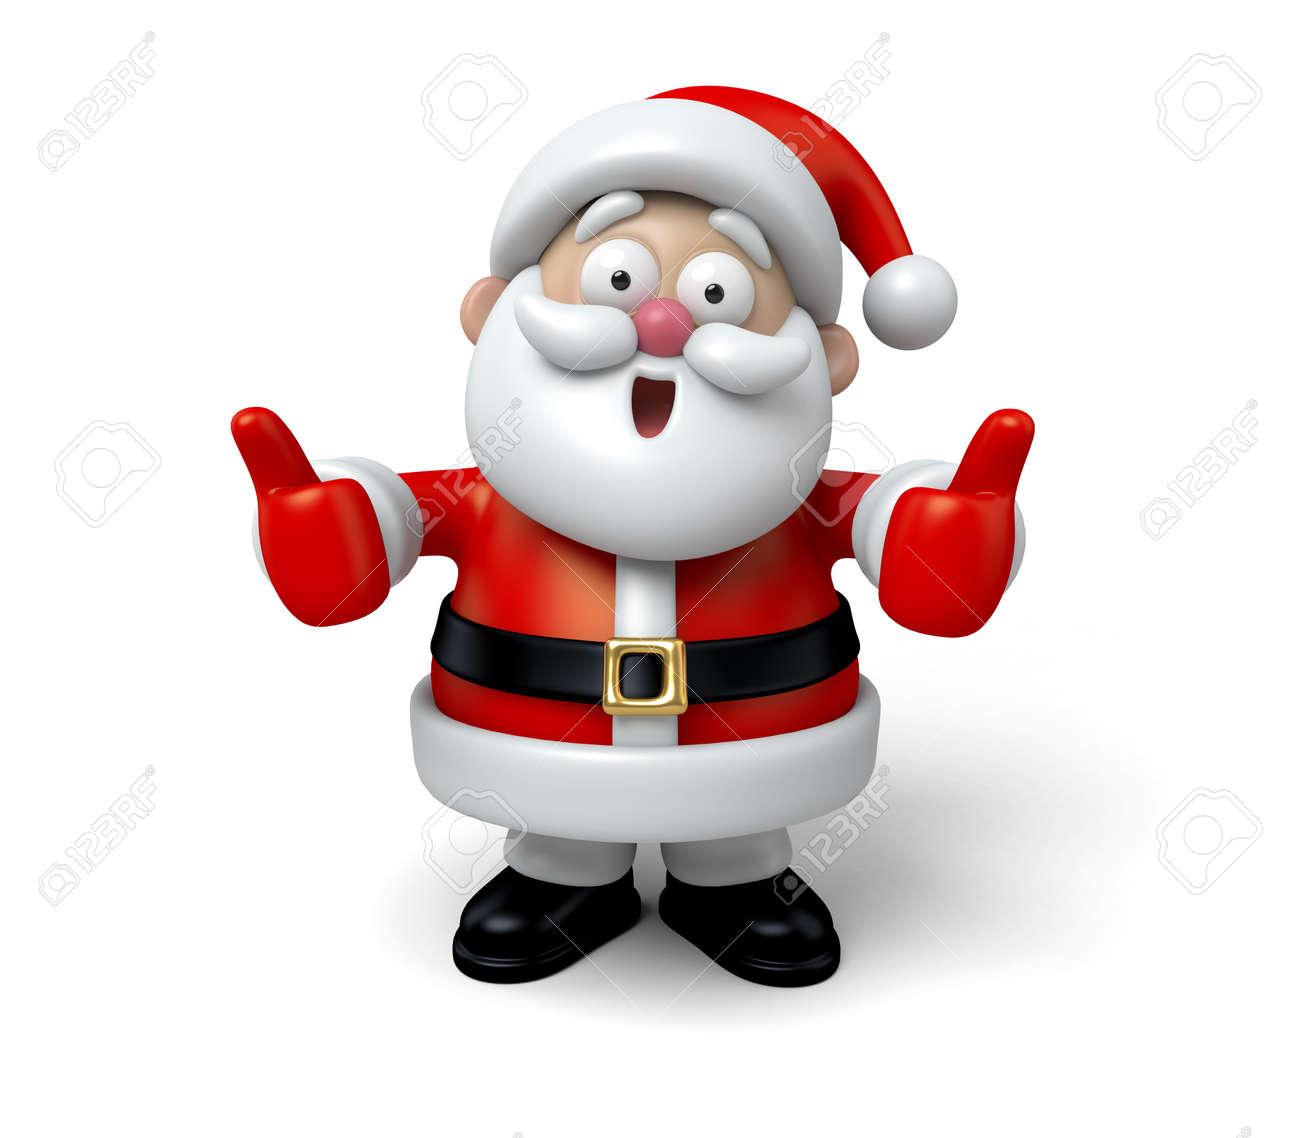 Santa with thumbs up - 47555867